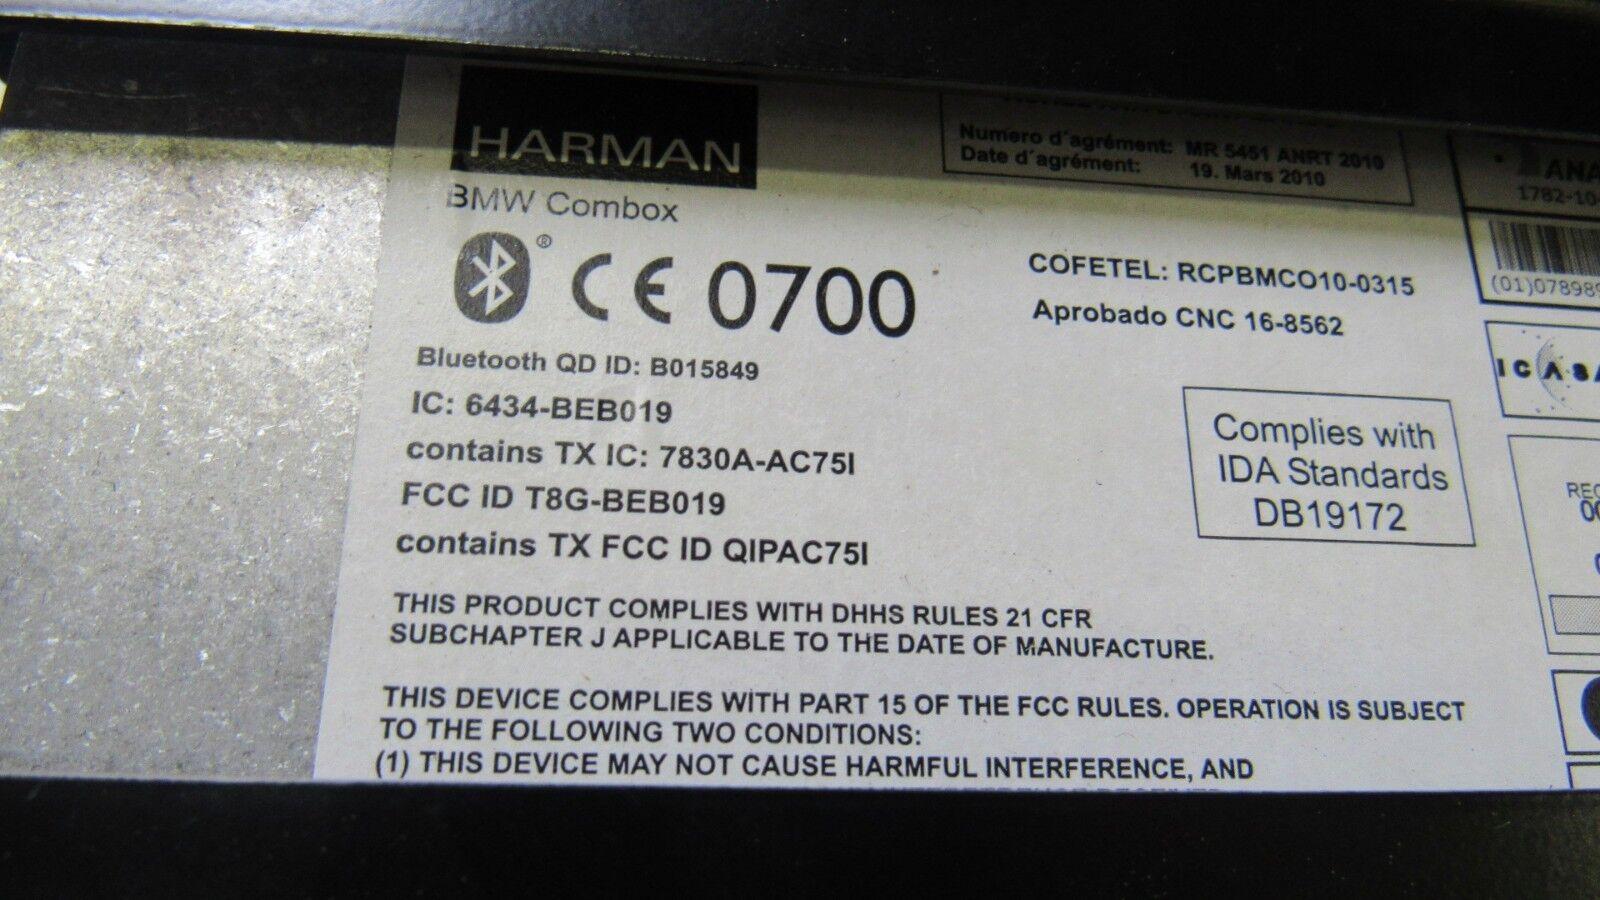 Used Bmw Controllers For Sale Page 12 F02 Fuse Box 528i 535i 550i F10 F30 F12 F01 F25 Oem Telematics Apps Combox 9257153